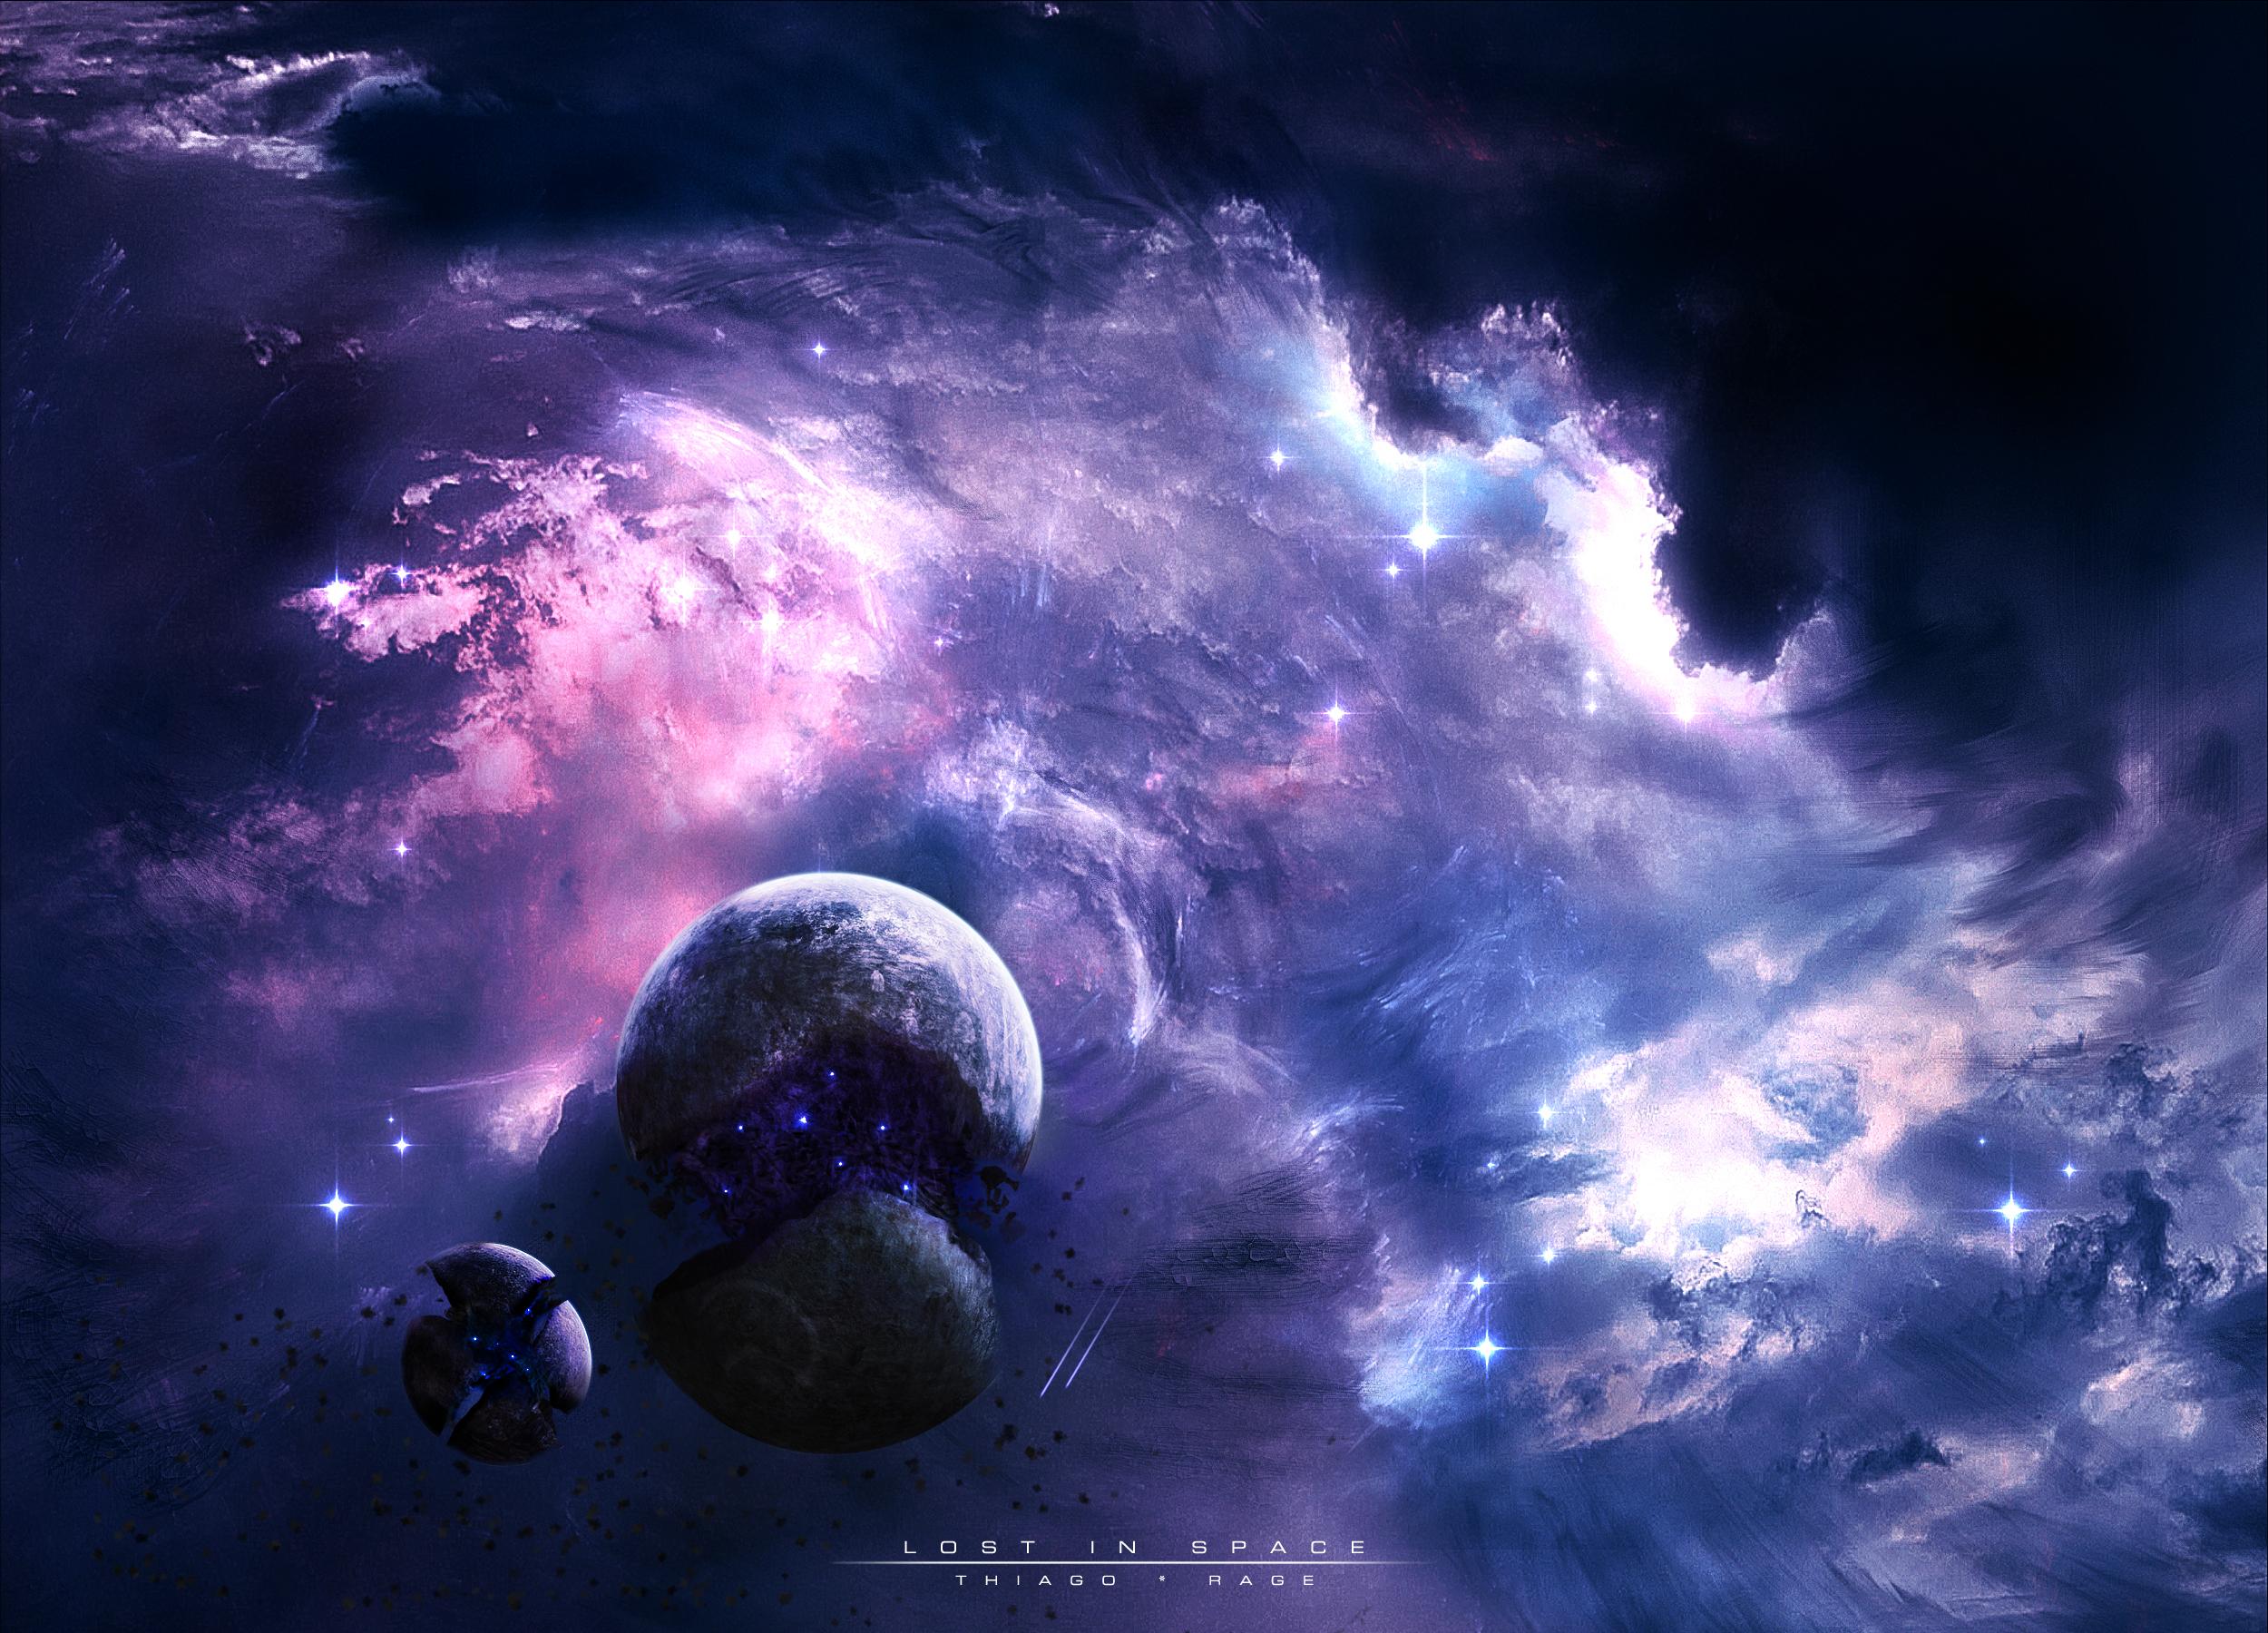 Обои частичка космоса картинки на рабочий стол на тему Космос - скачать скачать